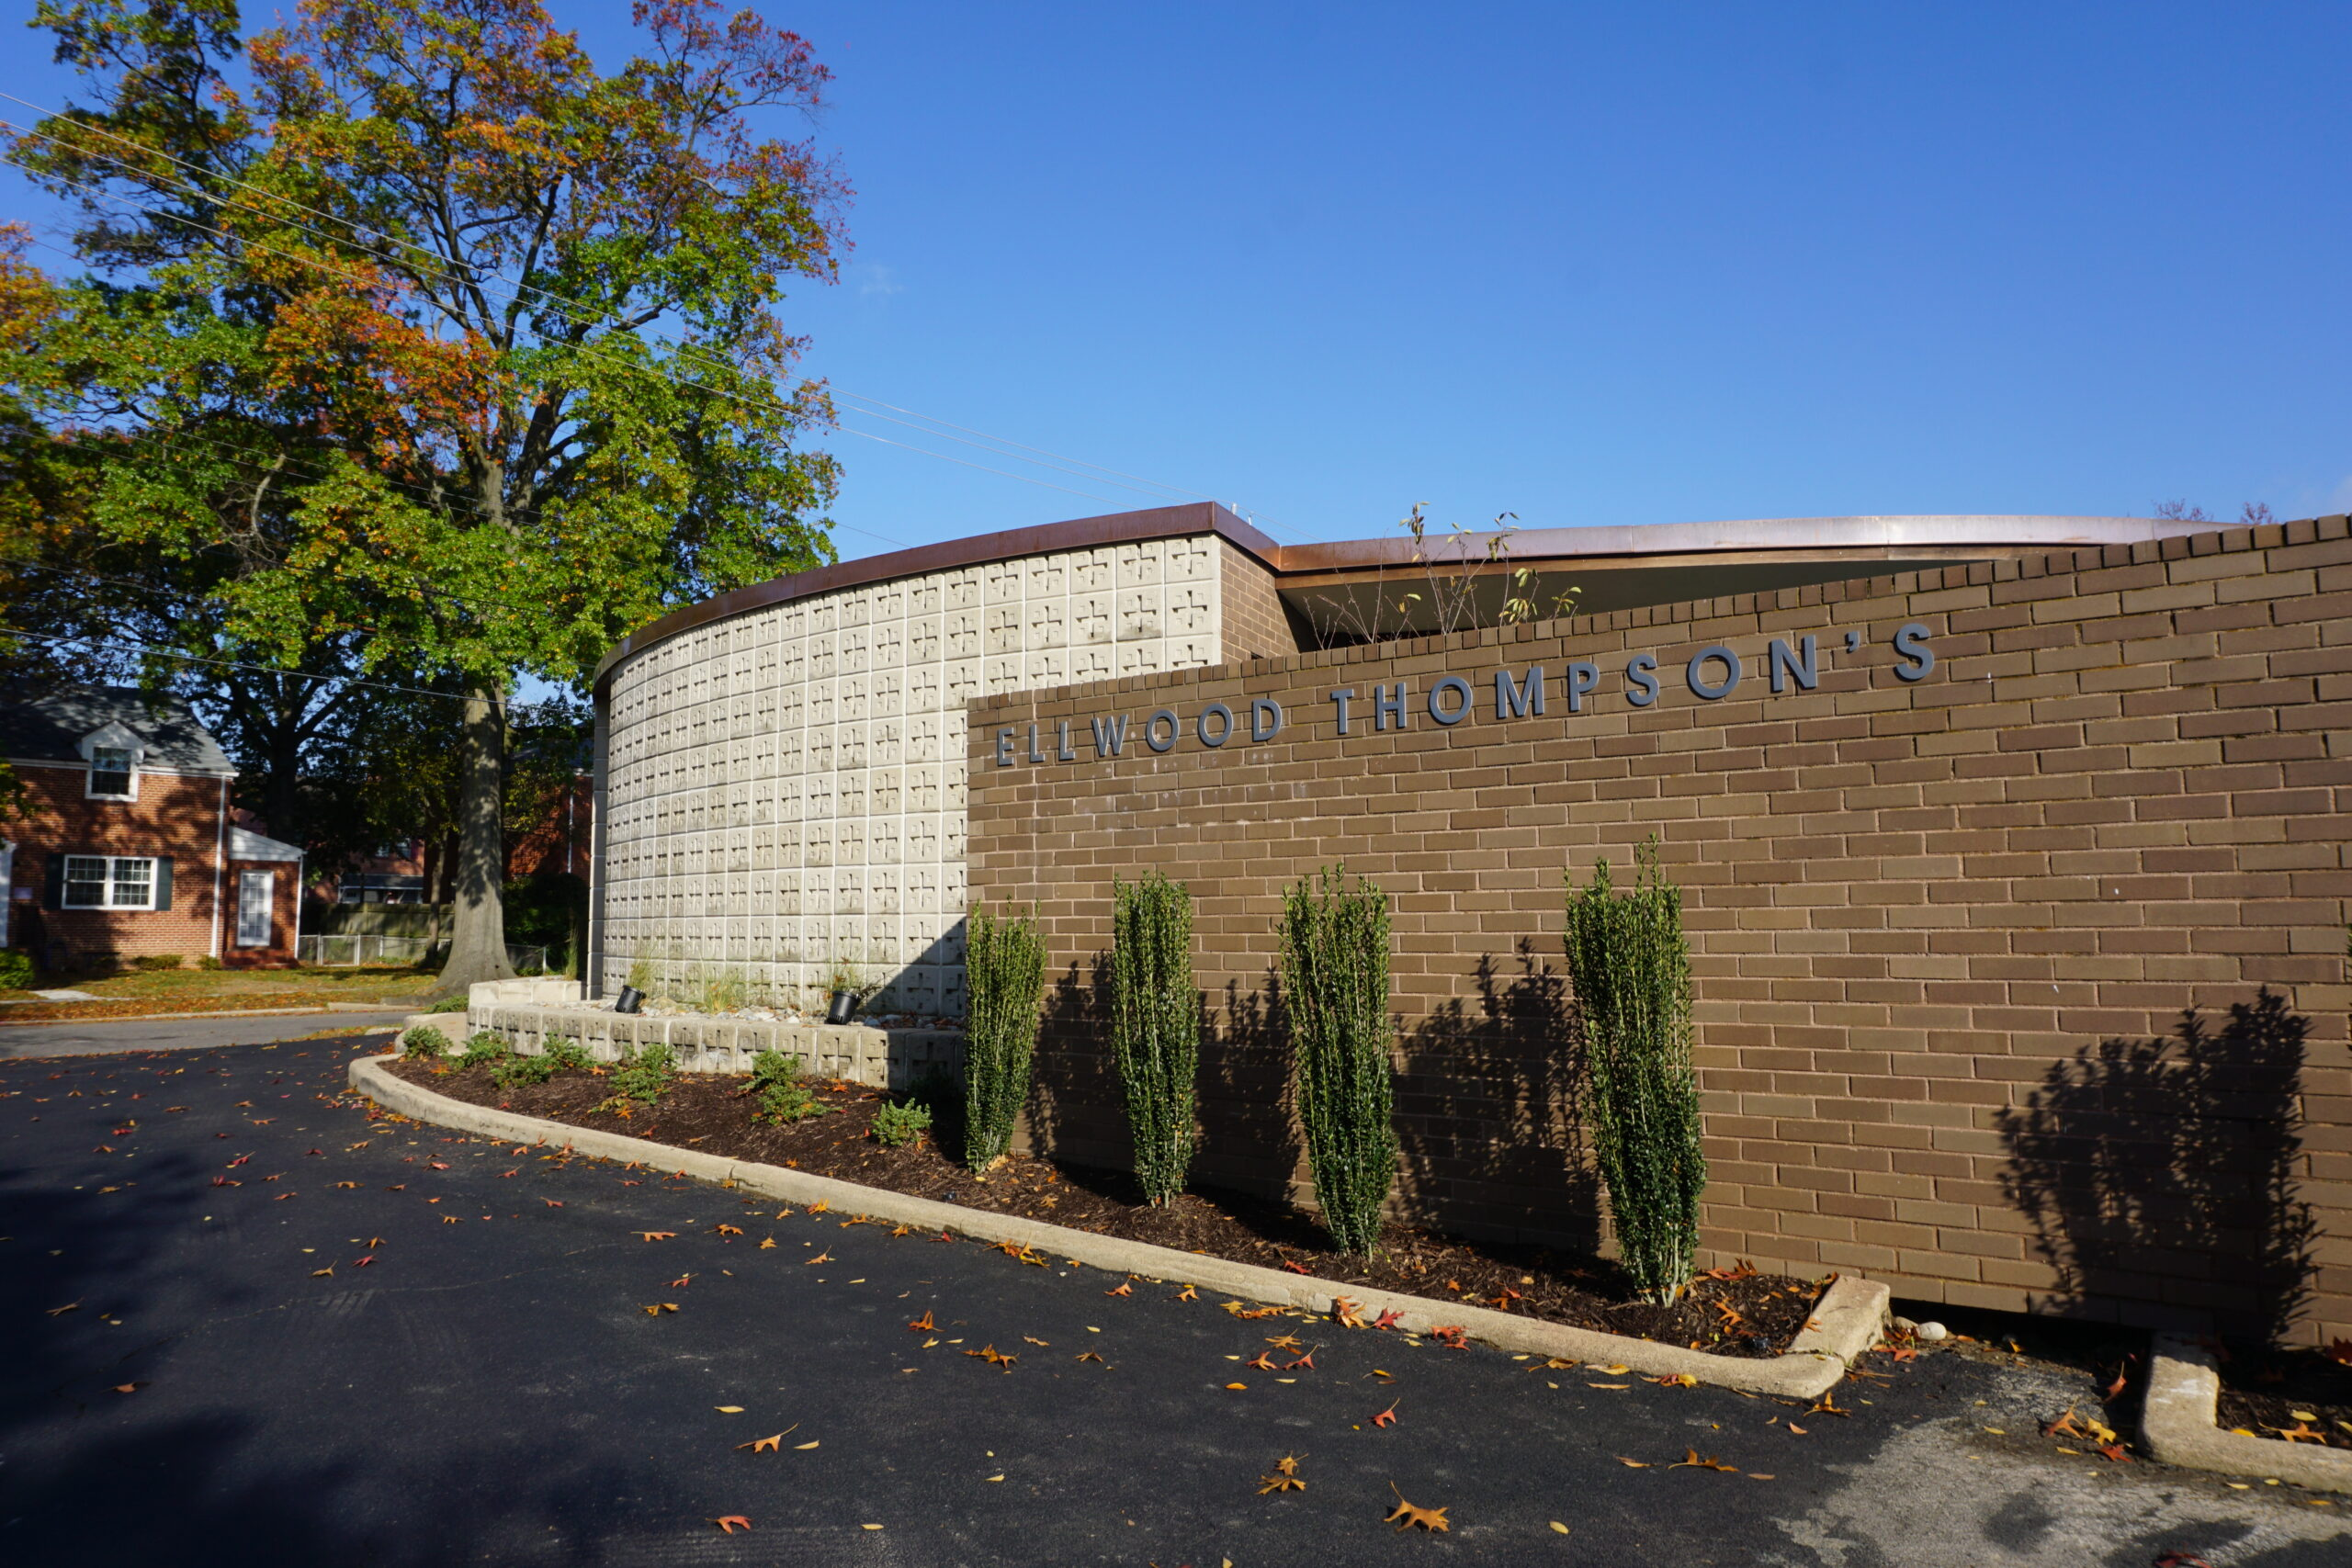 Ellwood Thompson's headquarters exterior